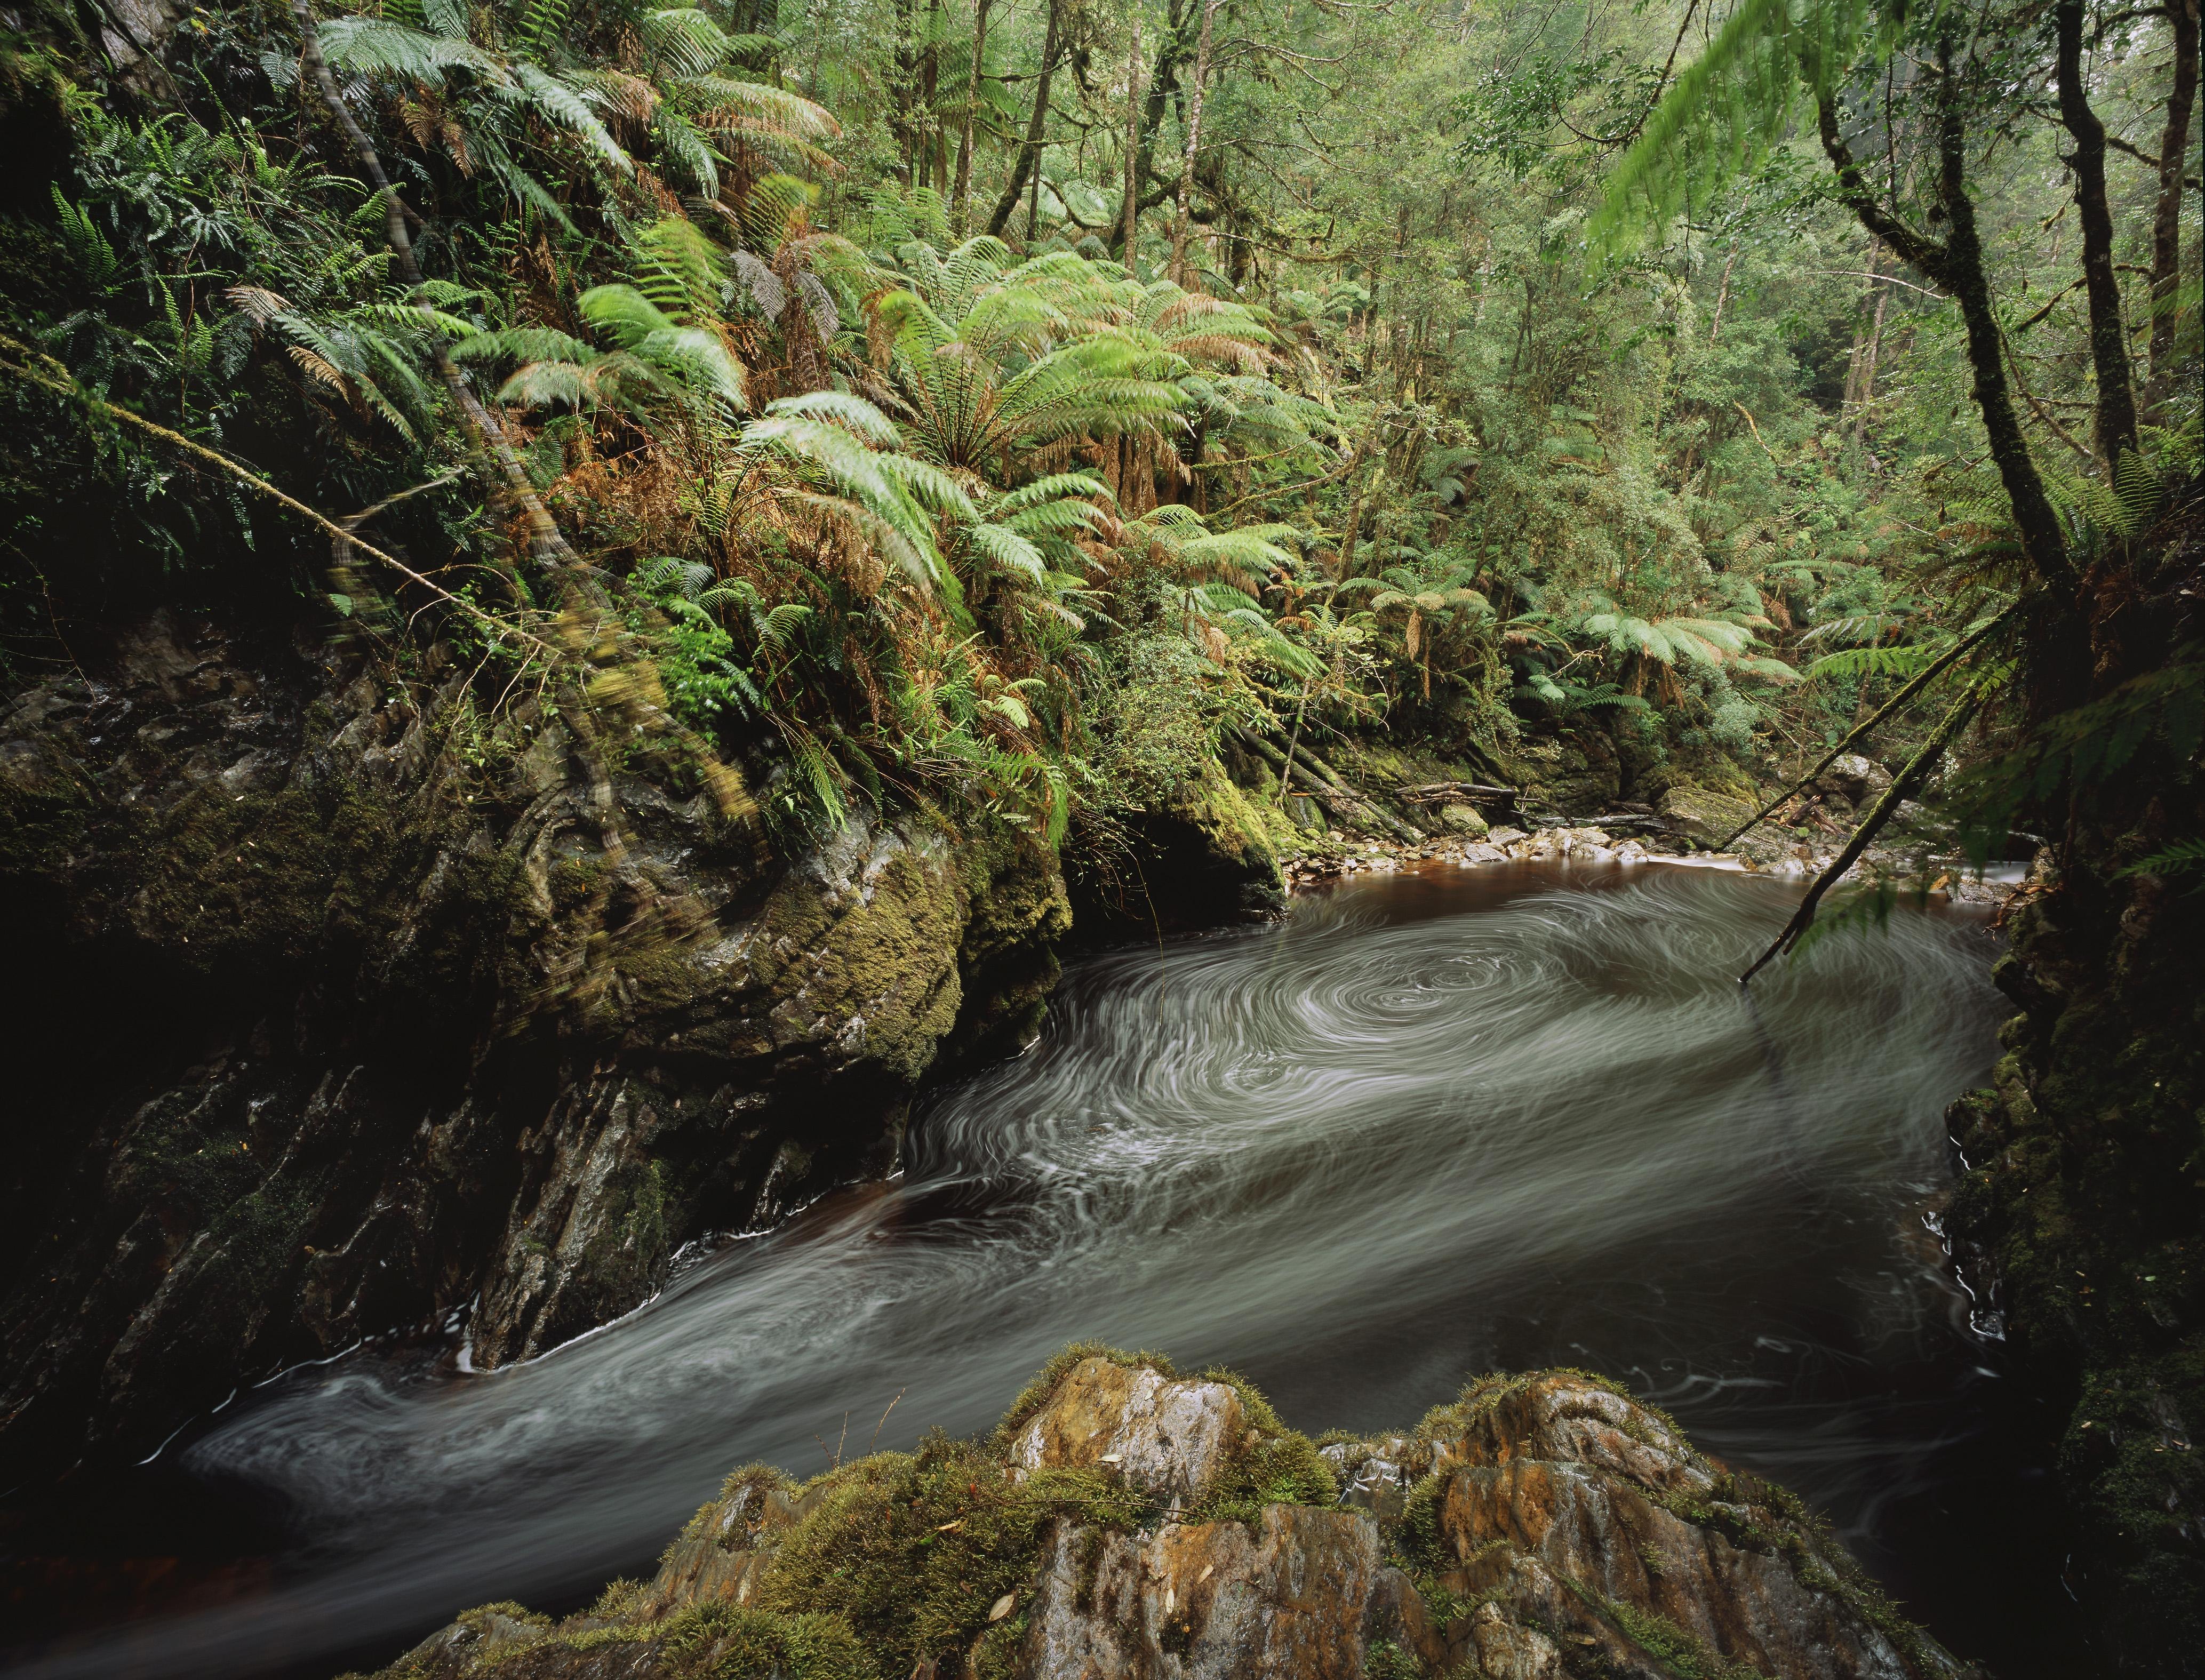 Eddies in the Bird River running through temperate rainforest, Western Tasmania, Australia